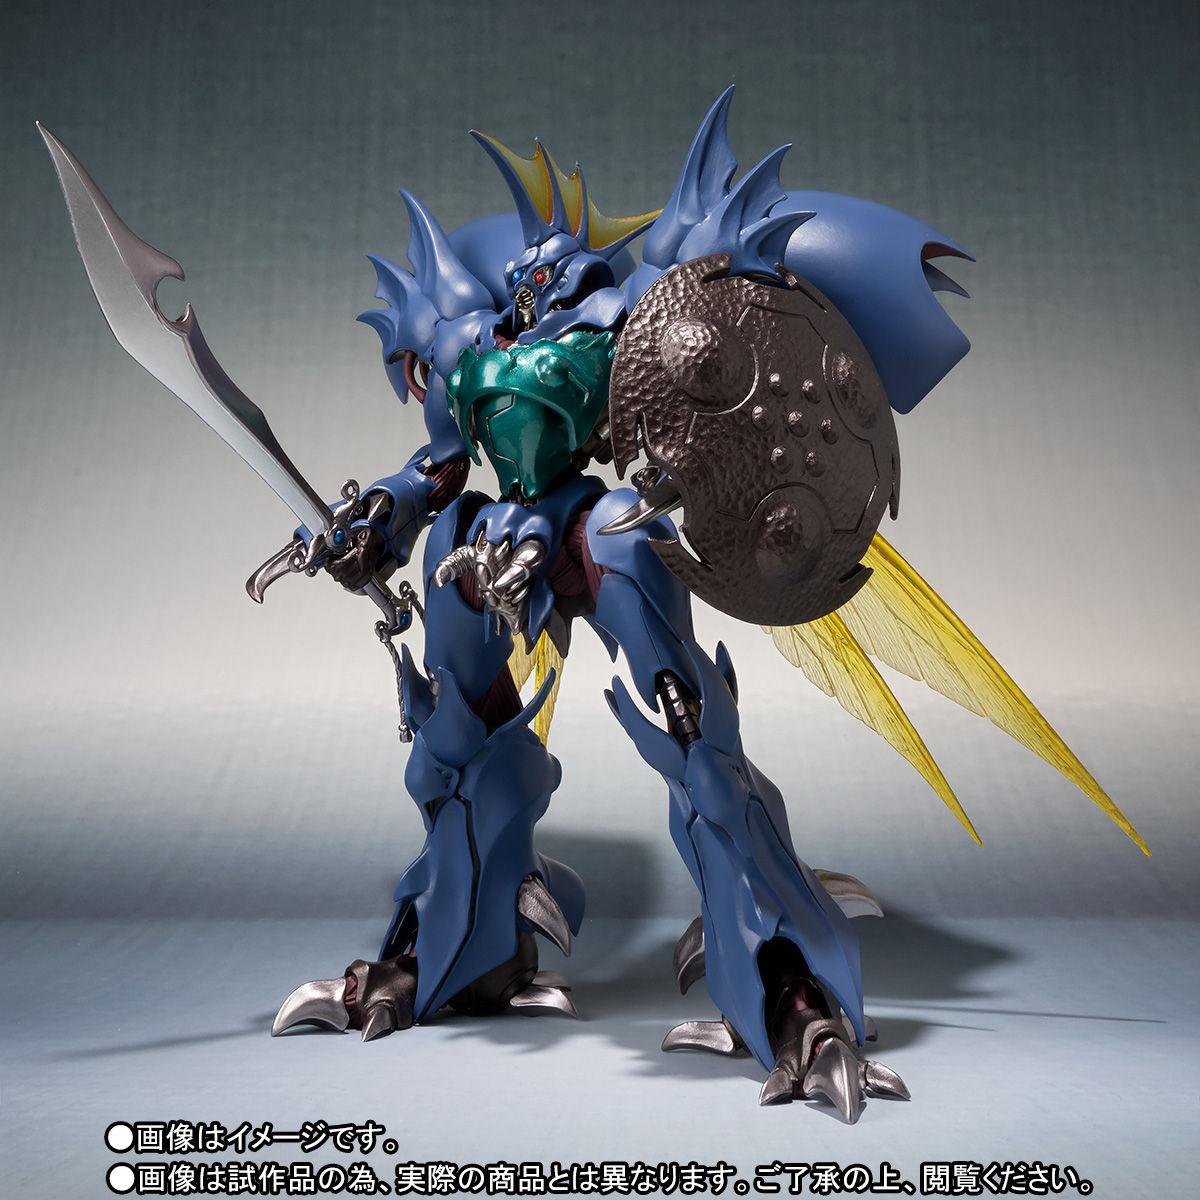 ROBOT魂〈SIDE AB〉『ギトール』聖戦士ダンバイン 可動フィギュア 可動フィギュア-002